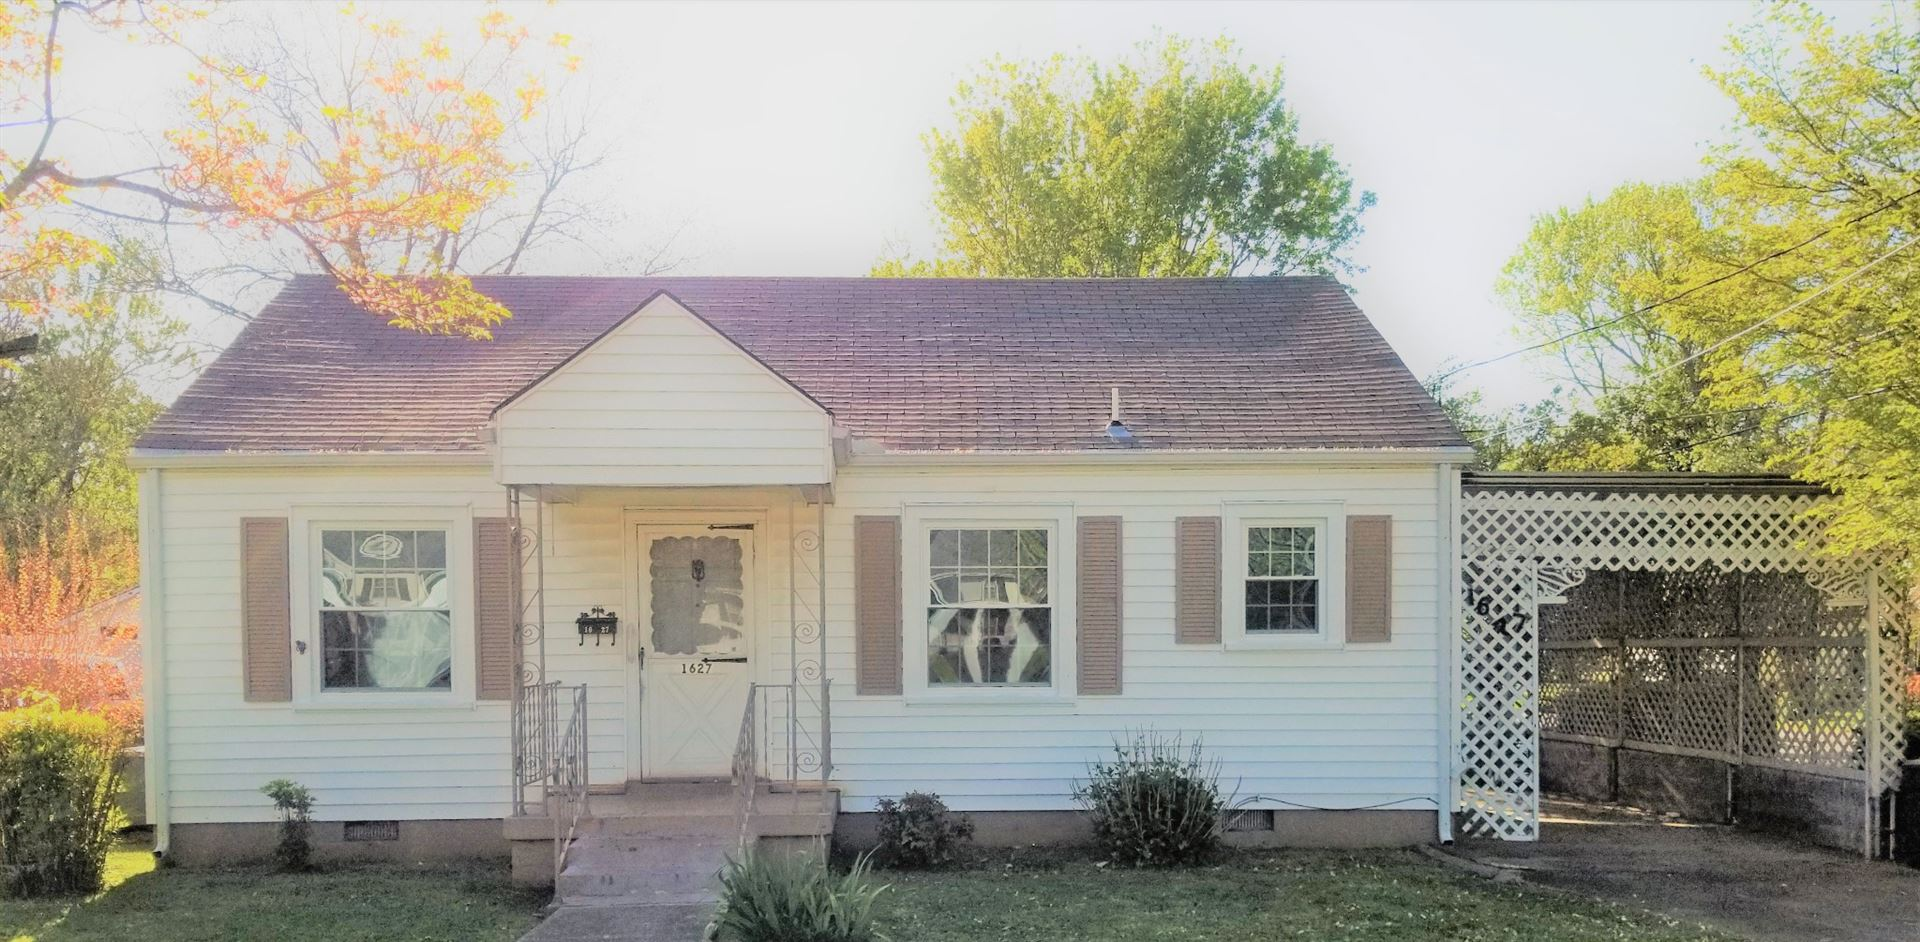 Photo of 1627 Kenneth Ave, Murfreesboro, TN 37129 (MLS # 2246758)